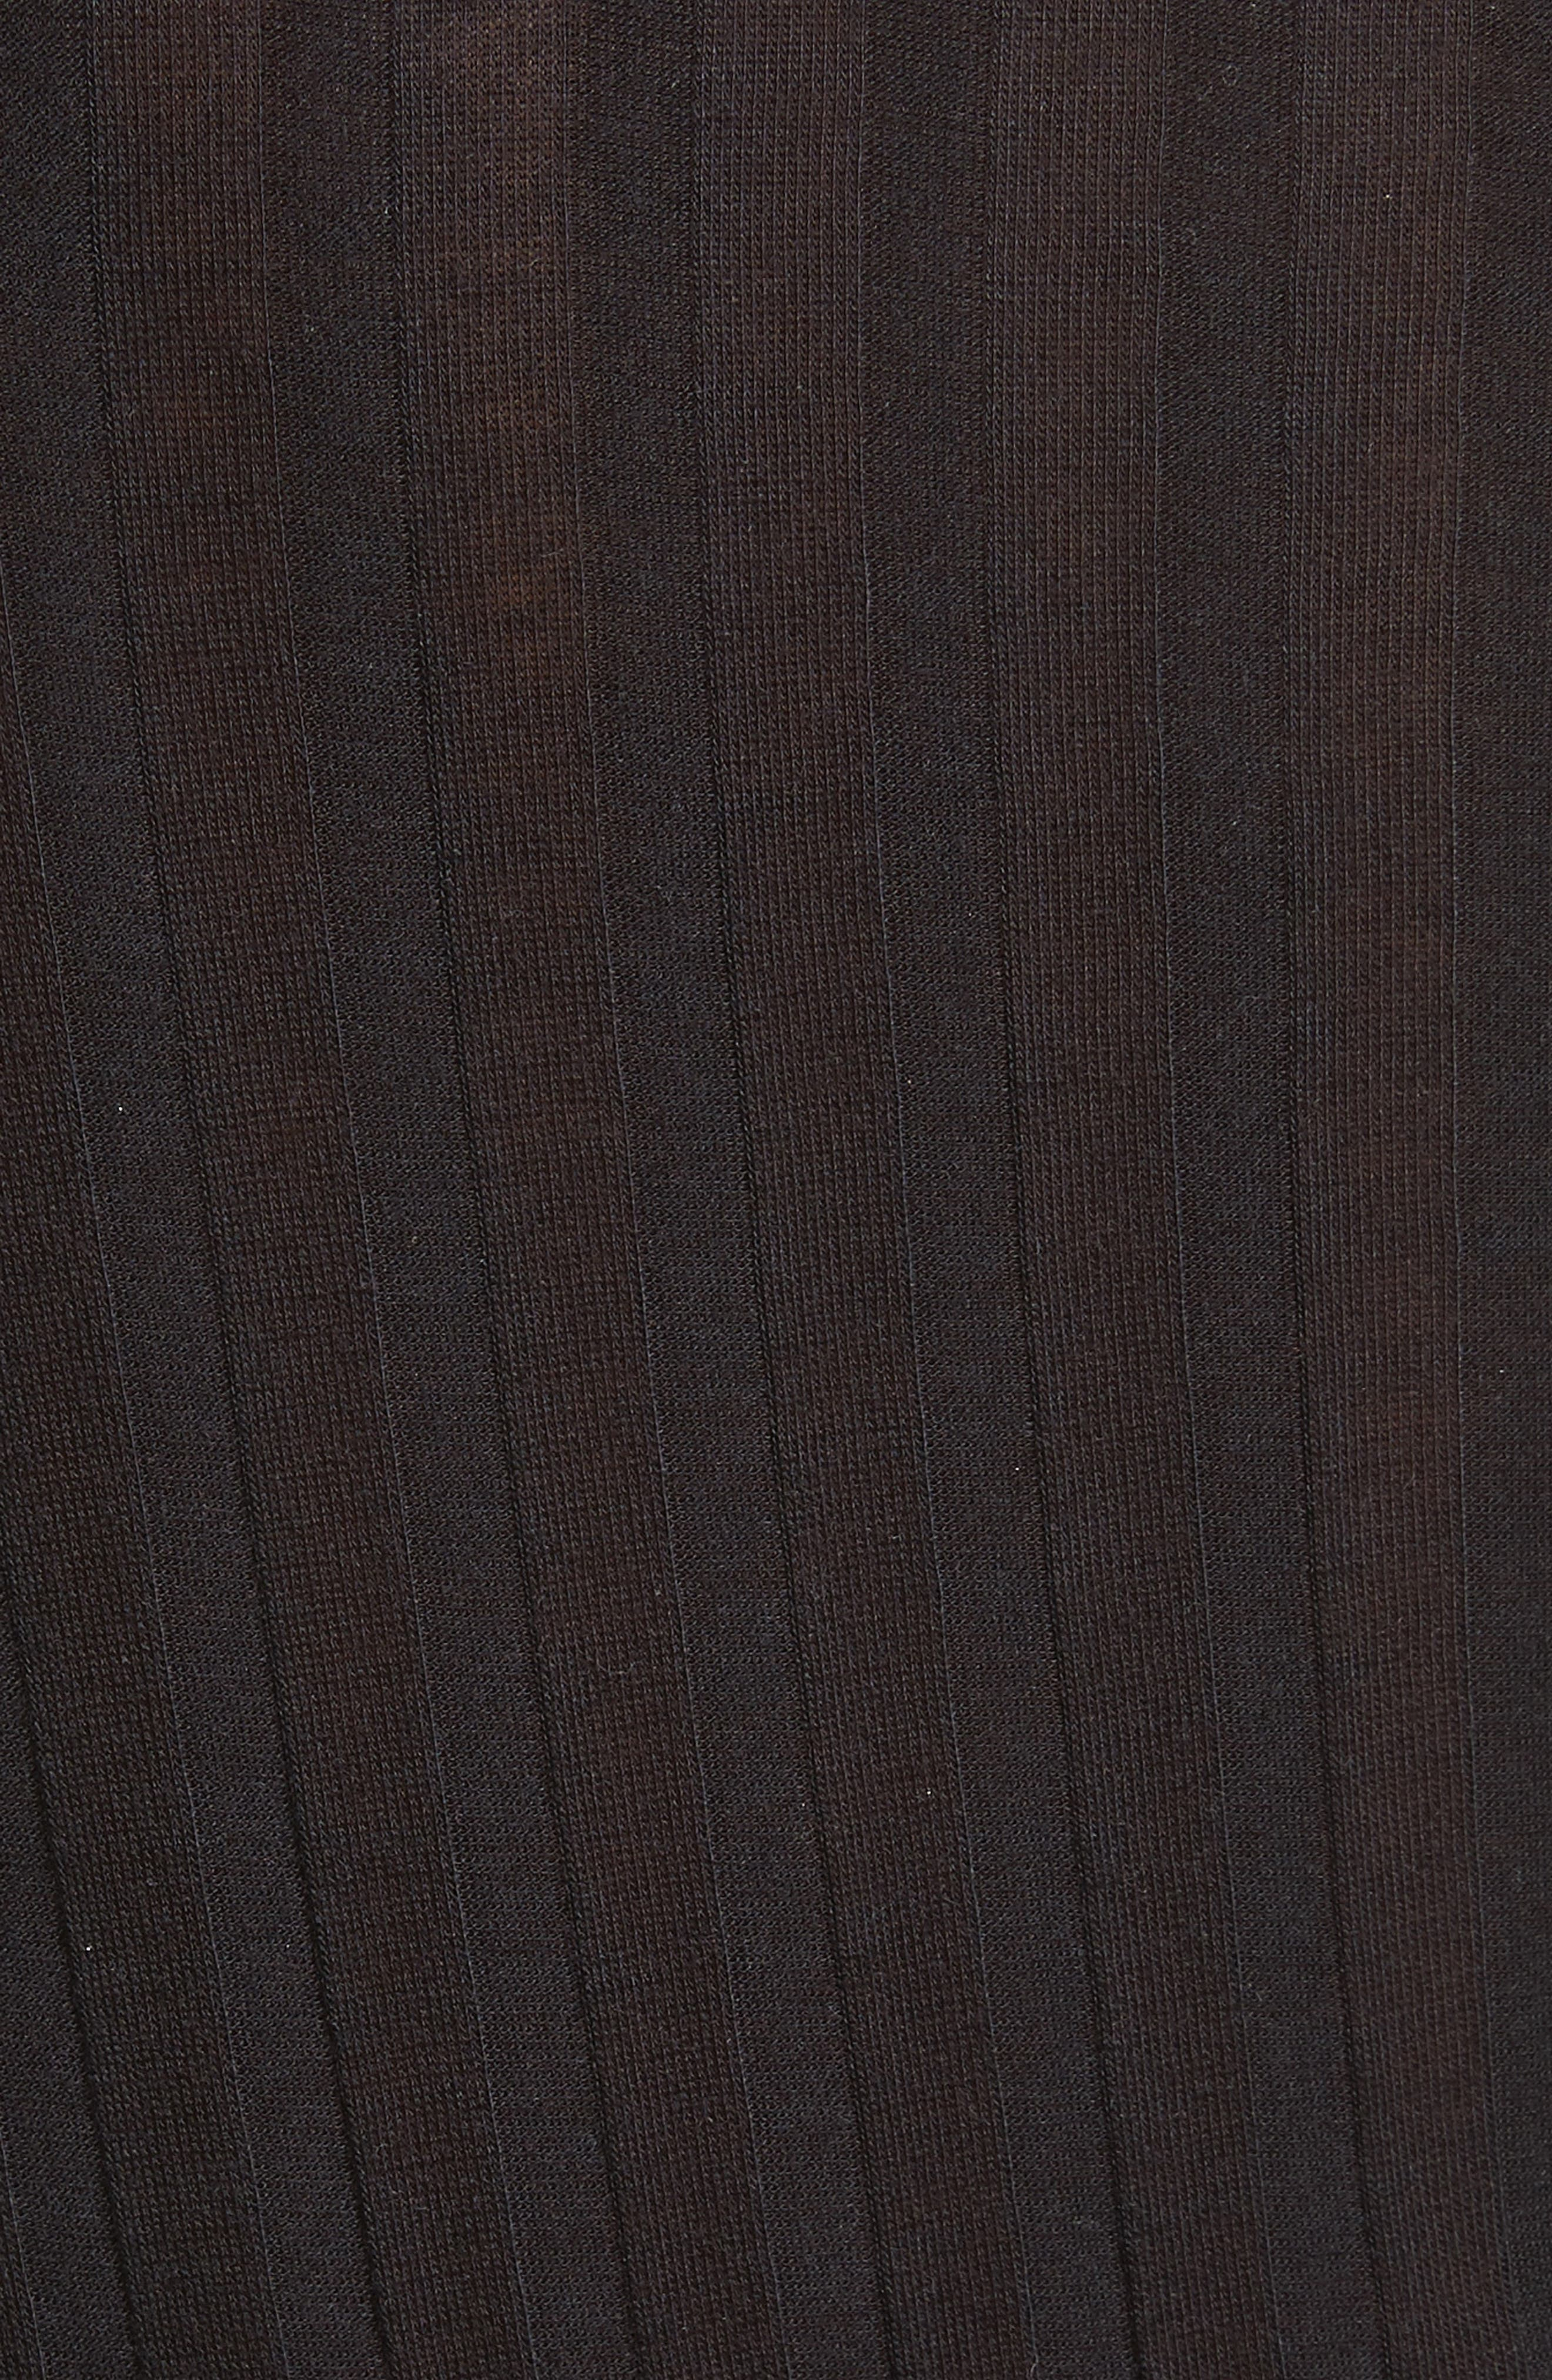 Lookout One-Shoulder Jersey Bodysuit,                             Alternate thumbnail 5, color,                             Black